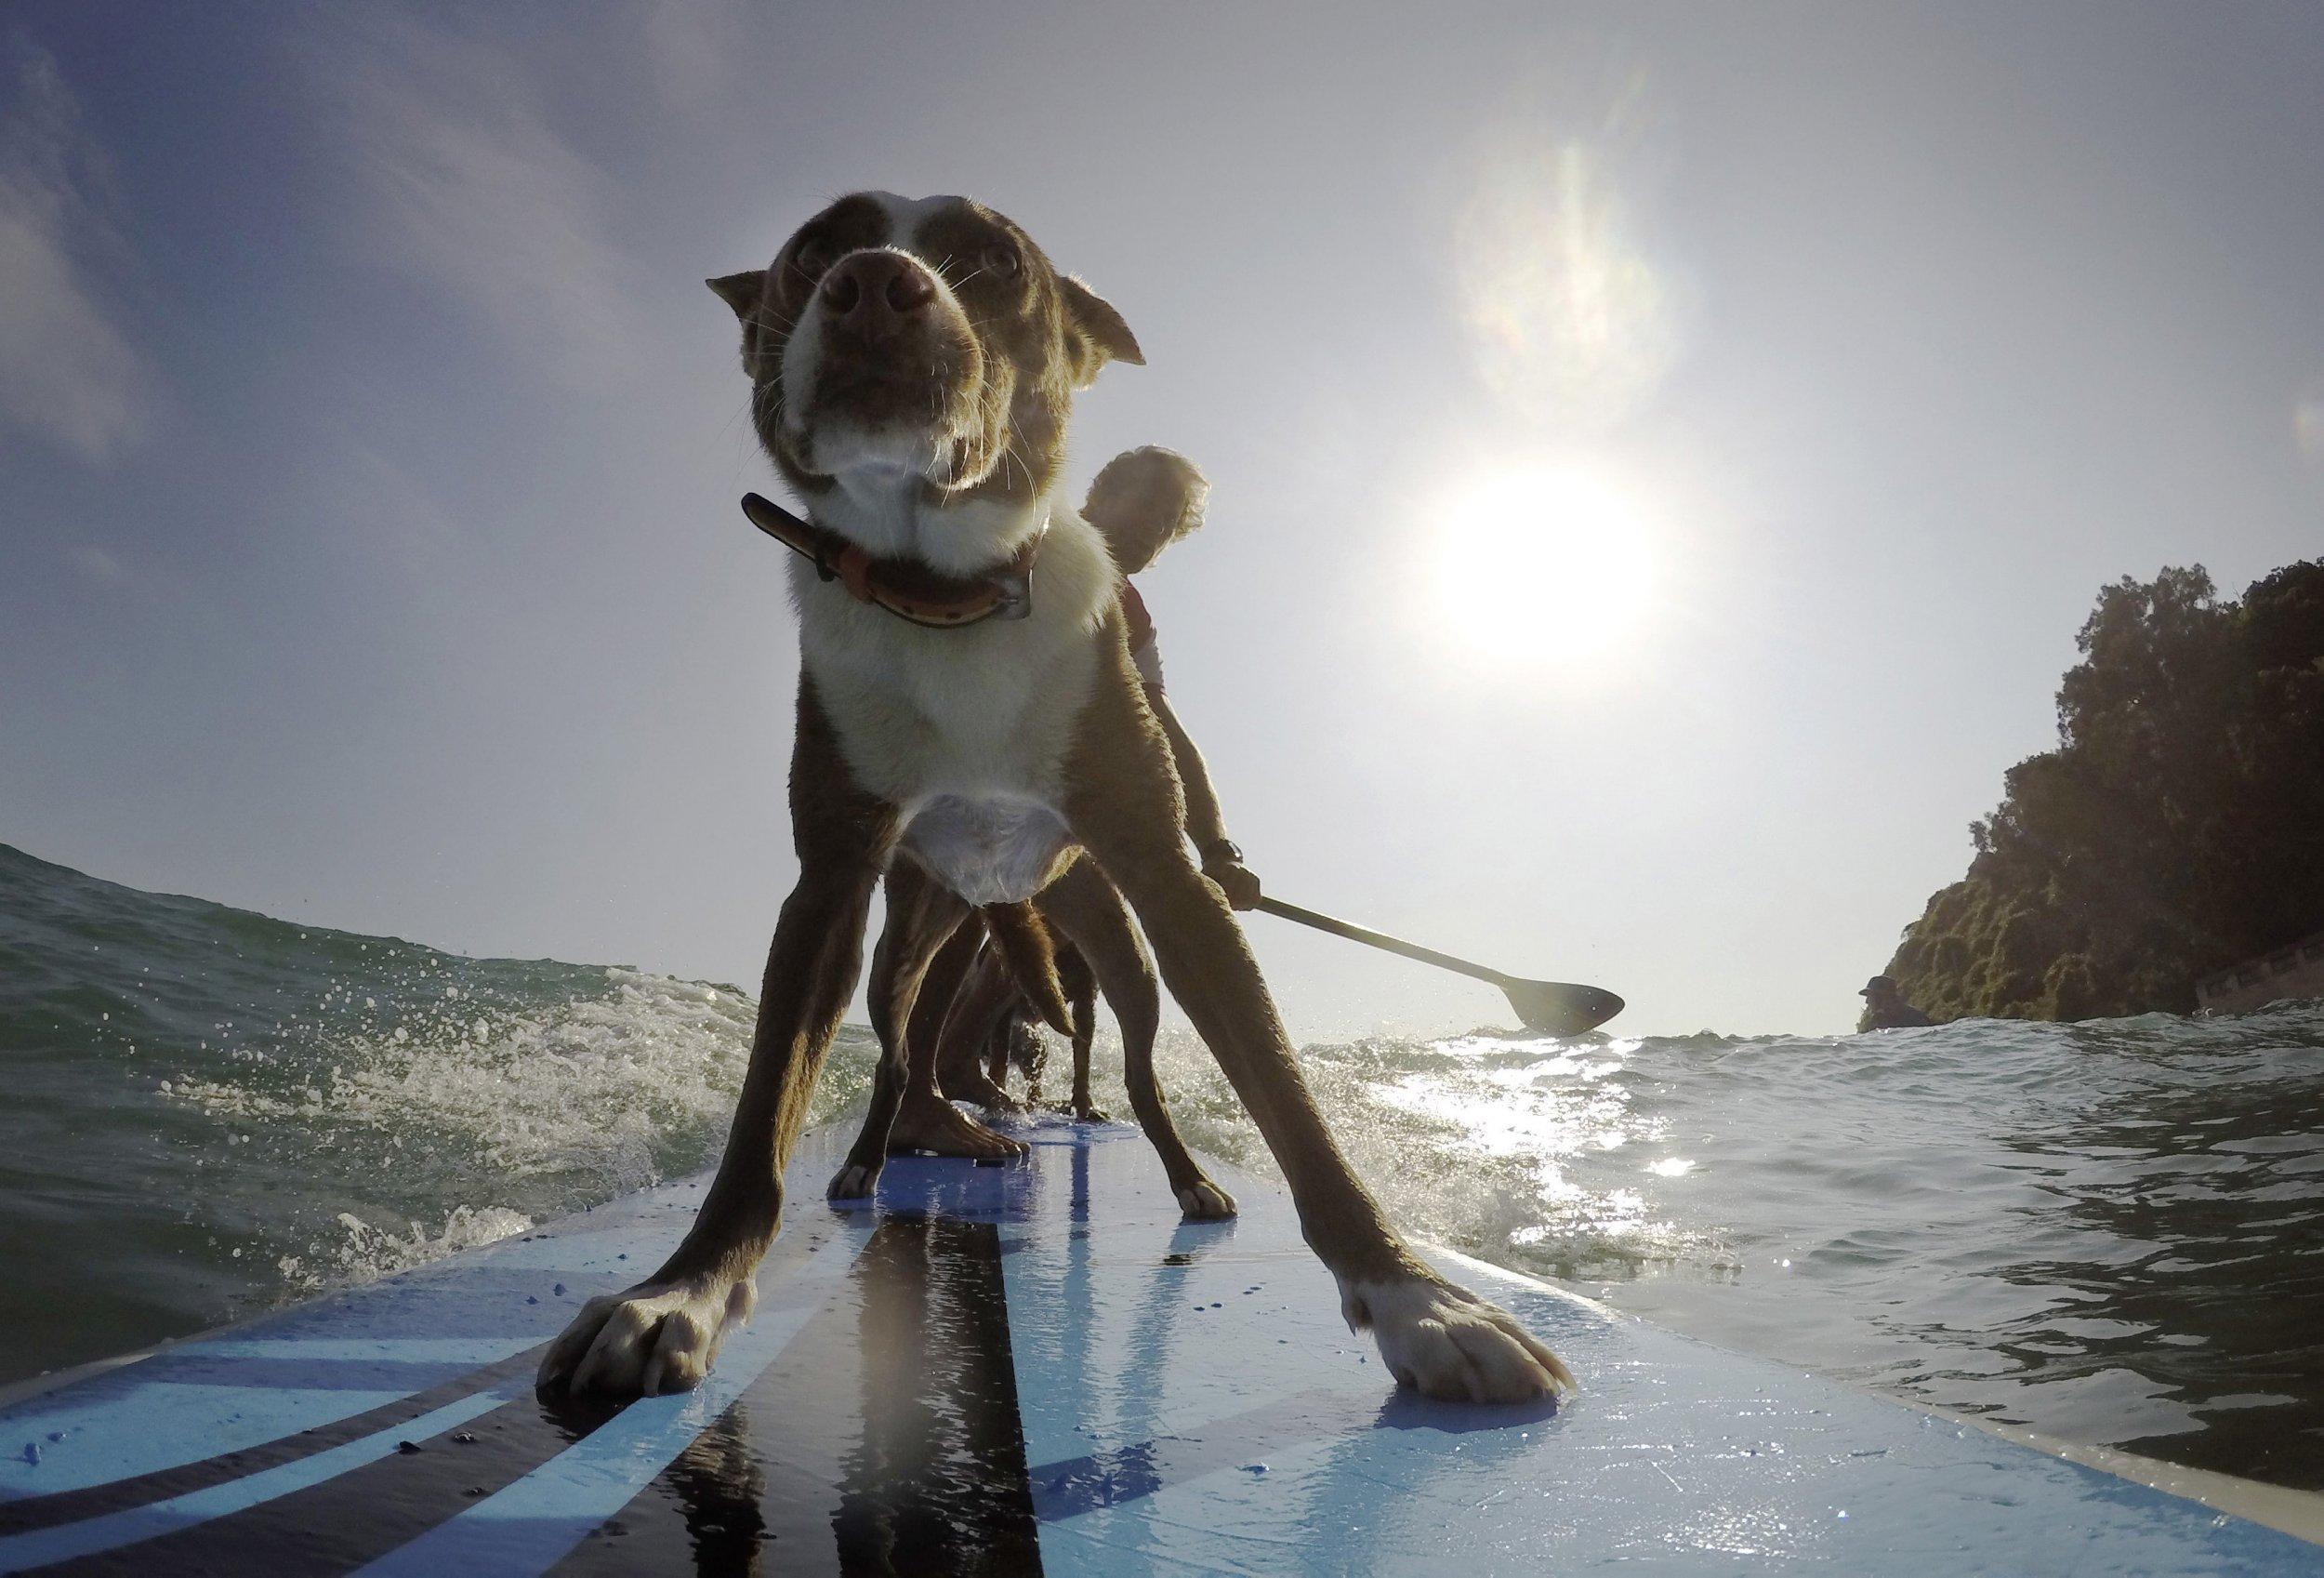 2016-02-18T072950Z_2125246325_D1AESNRTPEAB_RTRMADP_3_AUSTRALIA-SURFING-DOGS